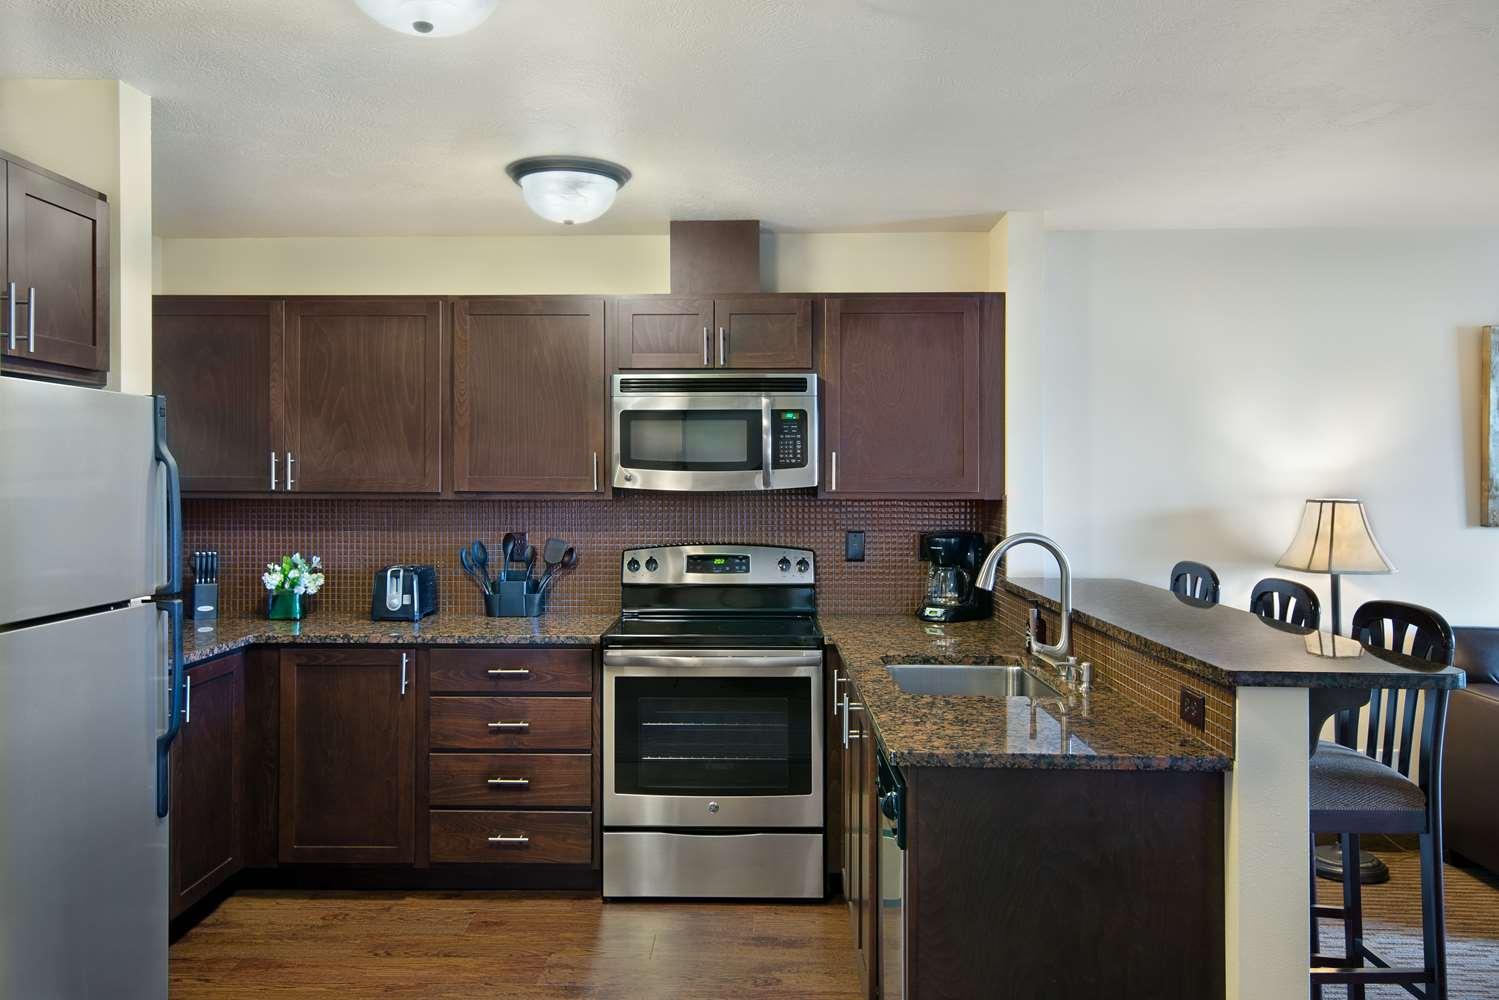 Oxford Suites Spokane Valley